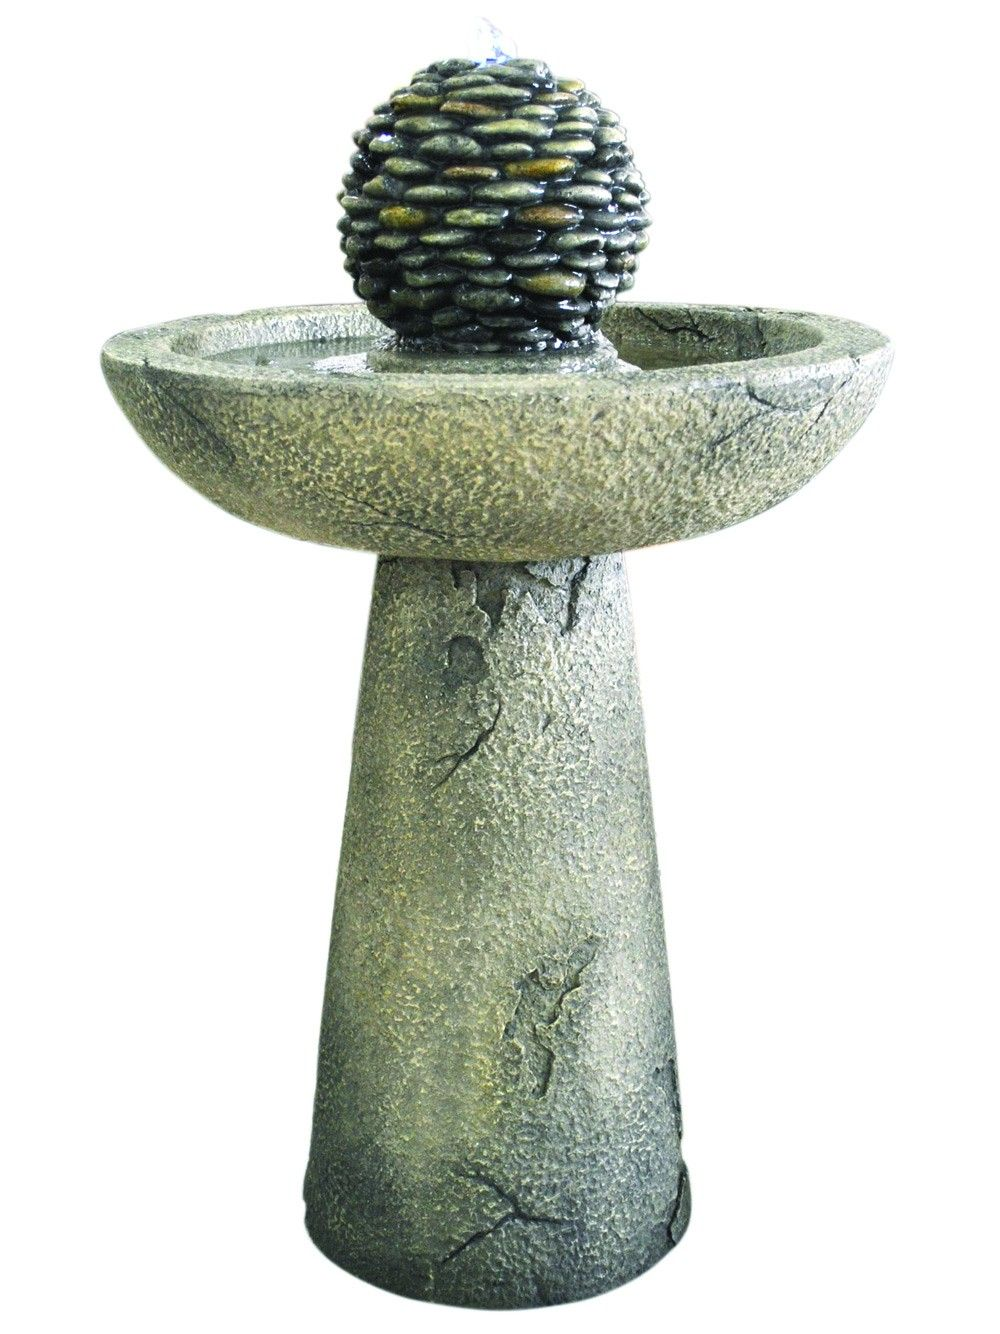 Kelkay Pebble Bird Bath Easy Fountain Water Feature | Pinterest ...